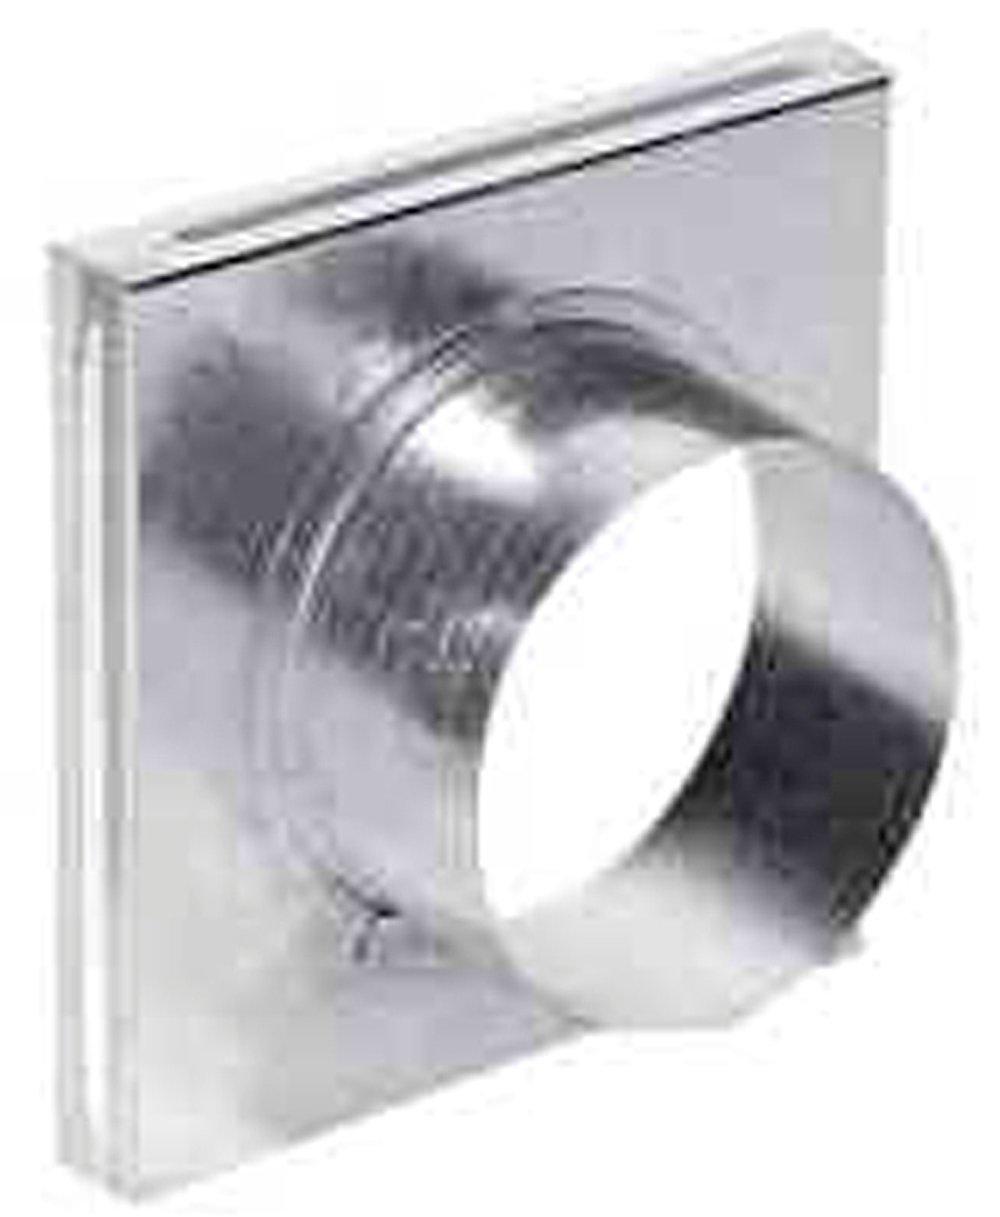 EMBOCADURA SIMPLE PARA REJILLA DE 17 X 17 CM para tubo de 80 mm de di/ámetro.